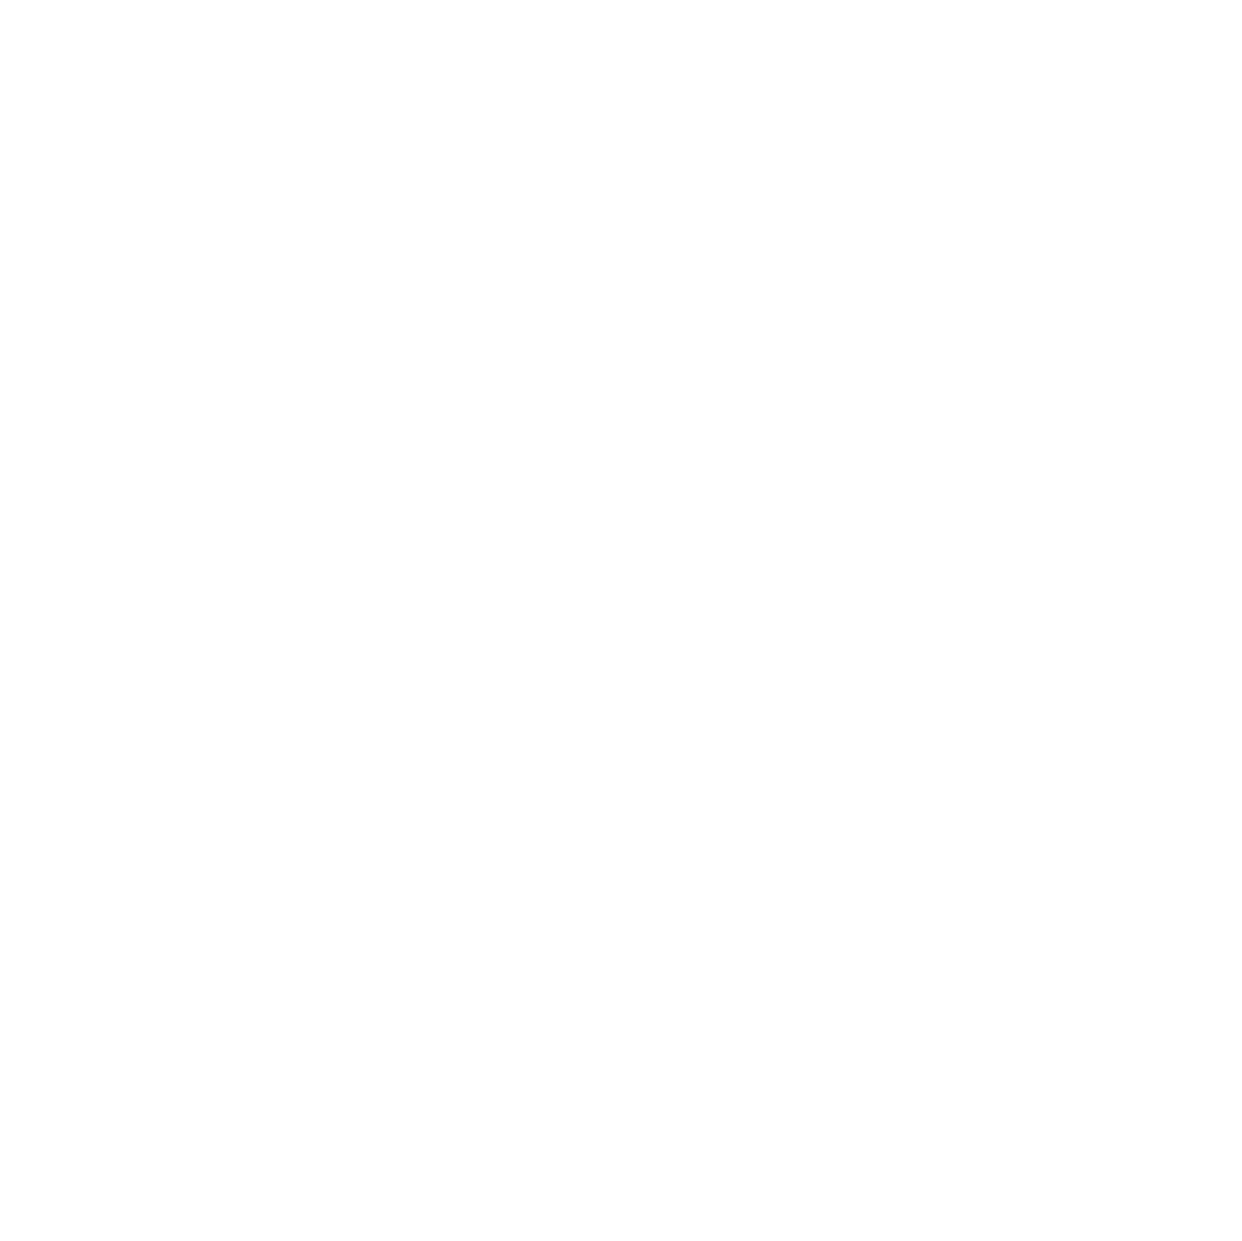 Aus Post.png